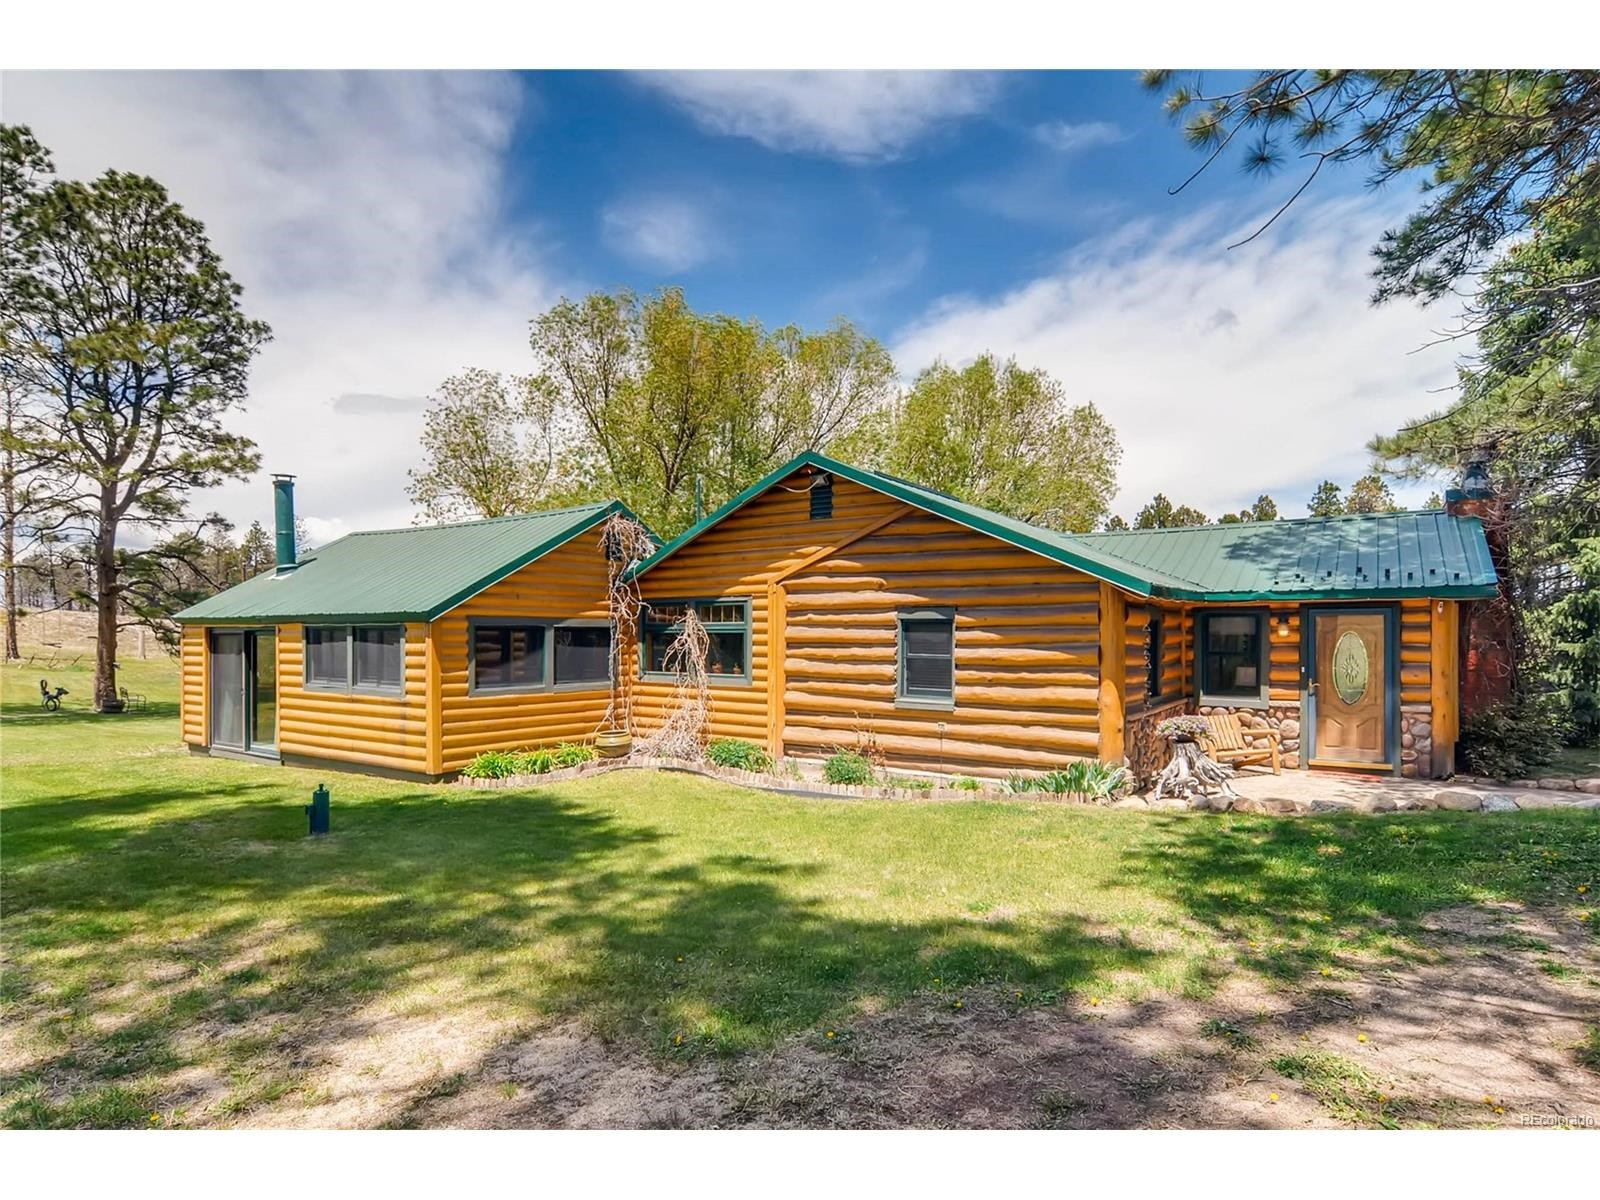 MLS# 9507785 - 3 - 12790 Black Forest Road, Colorado Springs, CO 80908